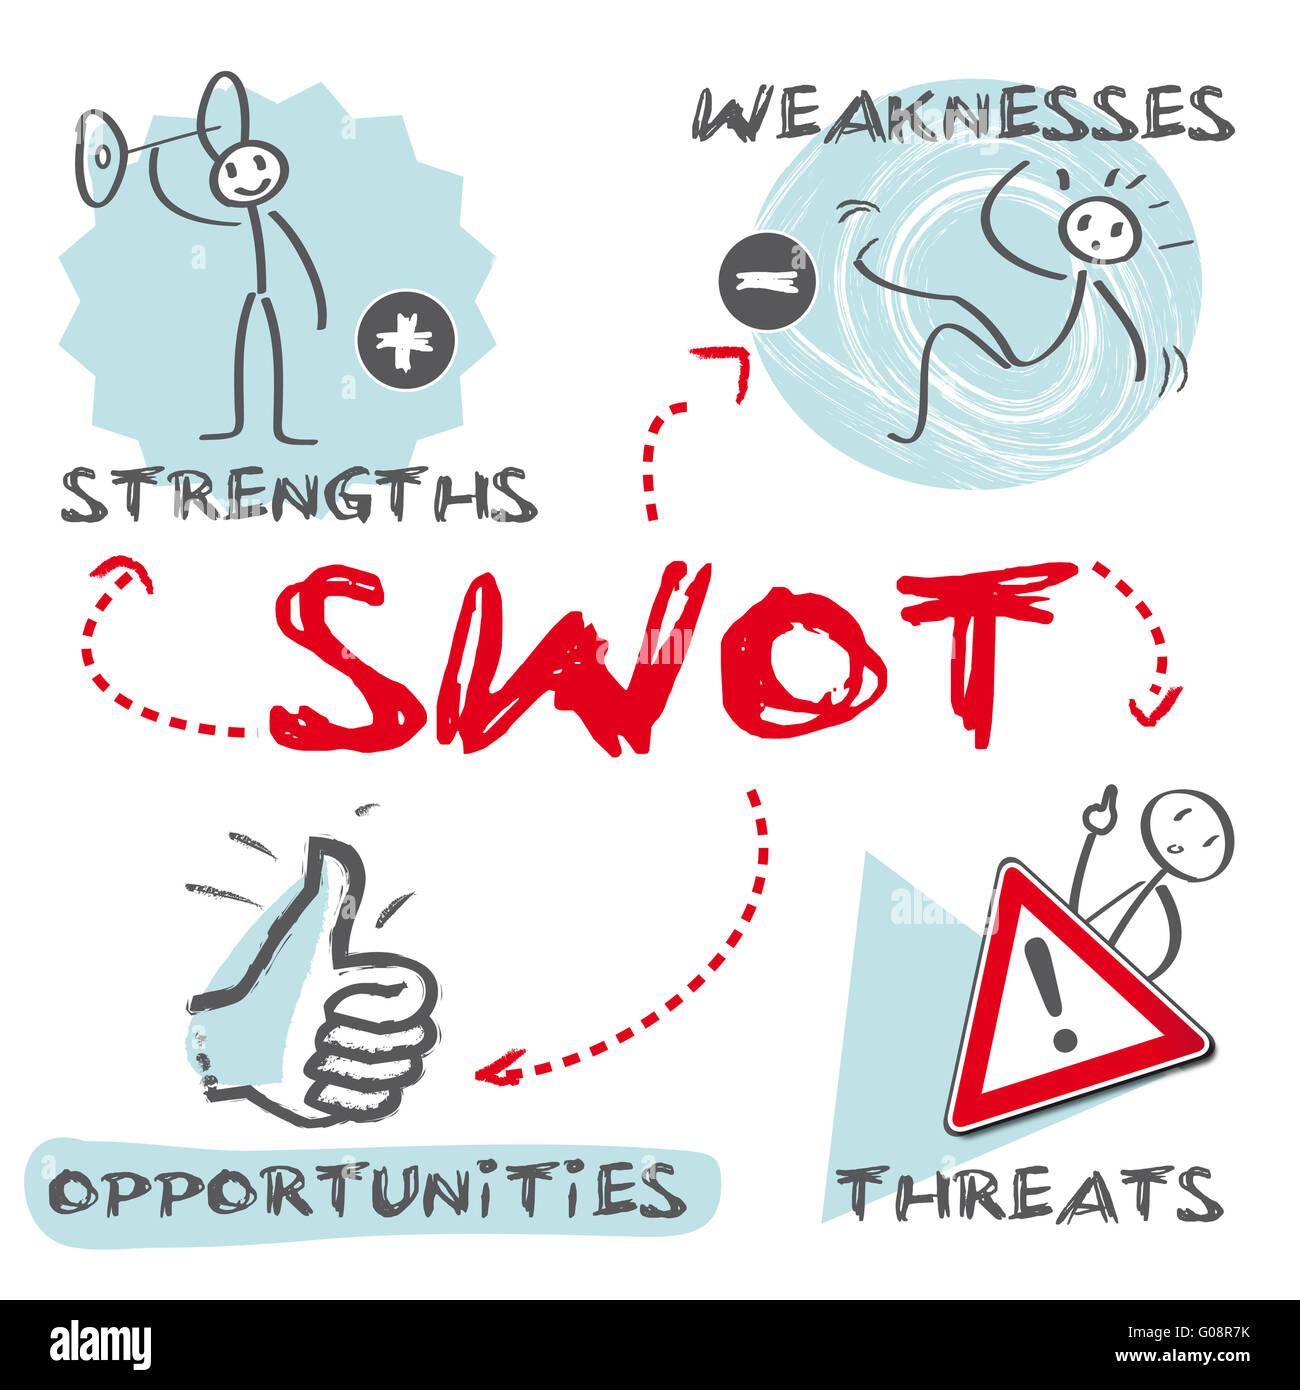 swot - Stock Image